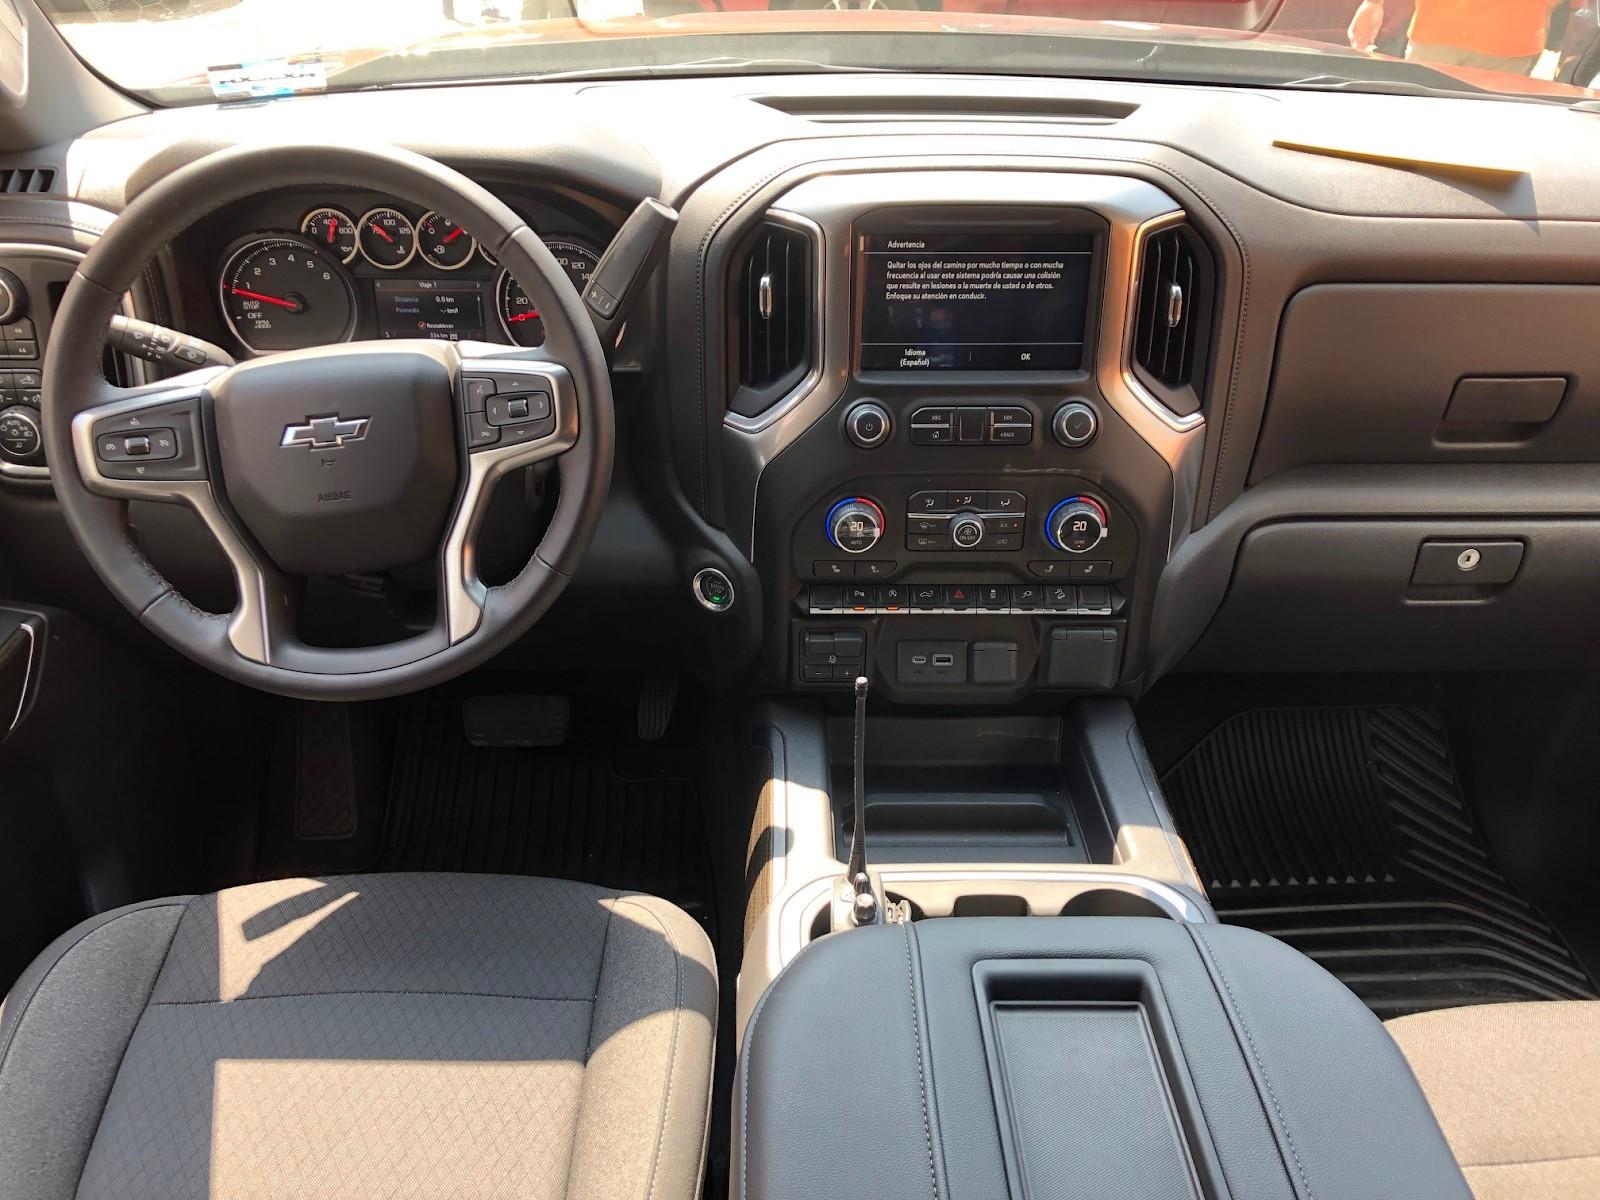 Interior de la Chevrolet Cheyenne